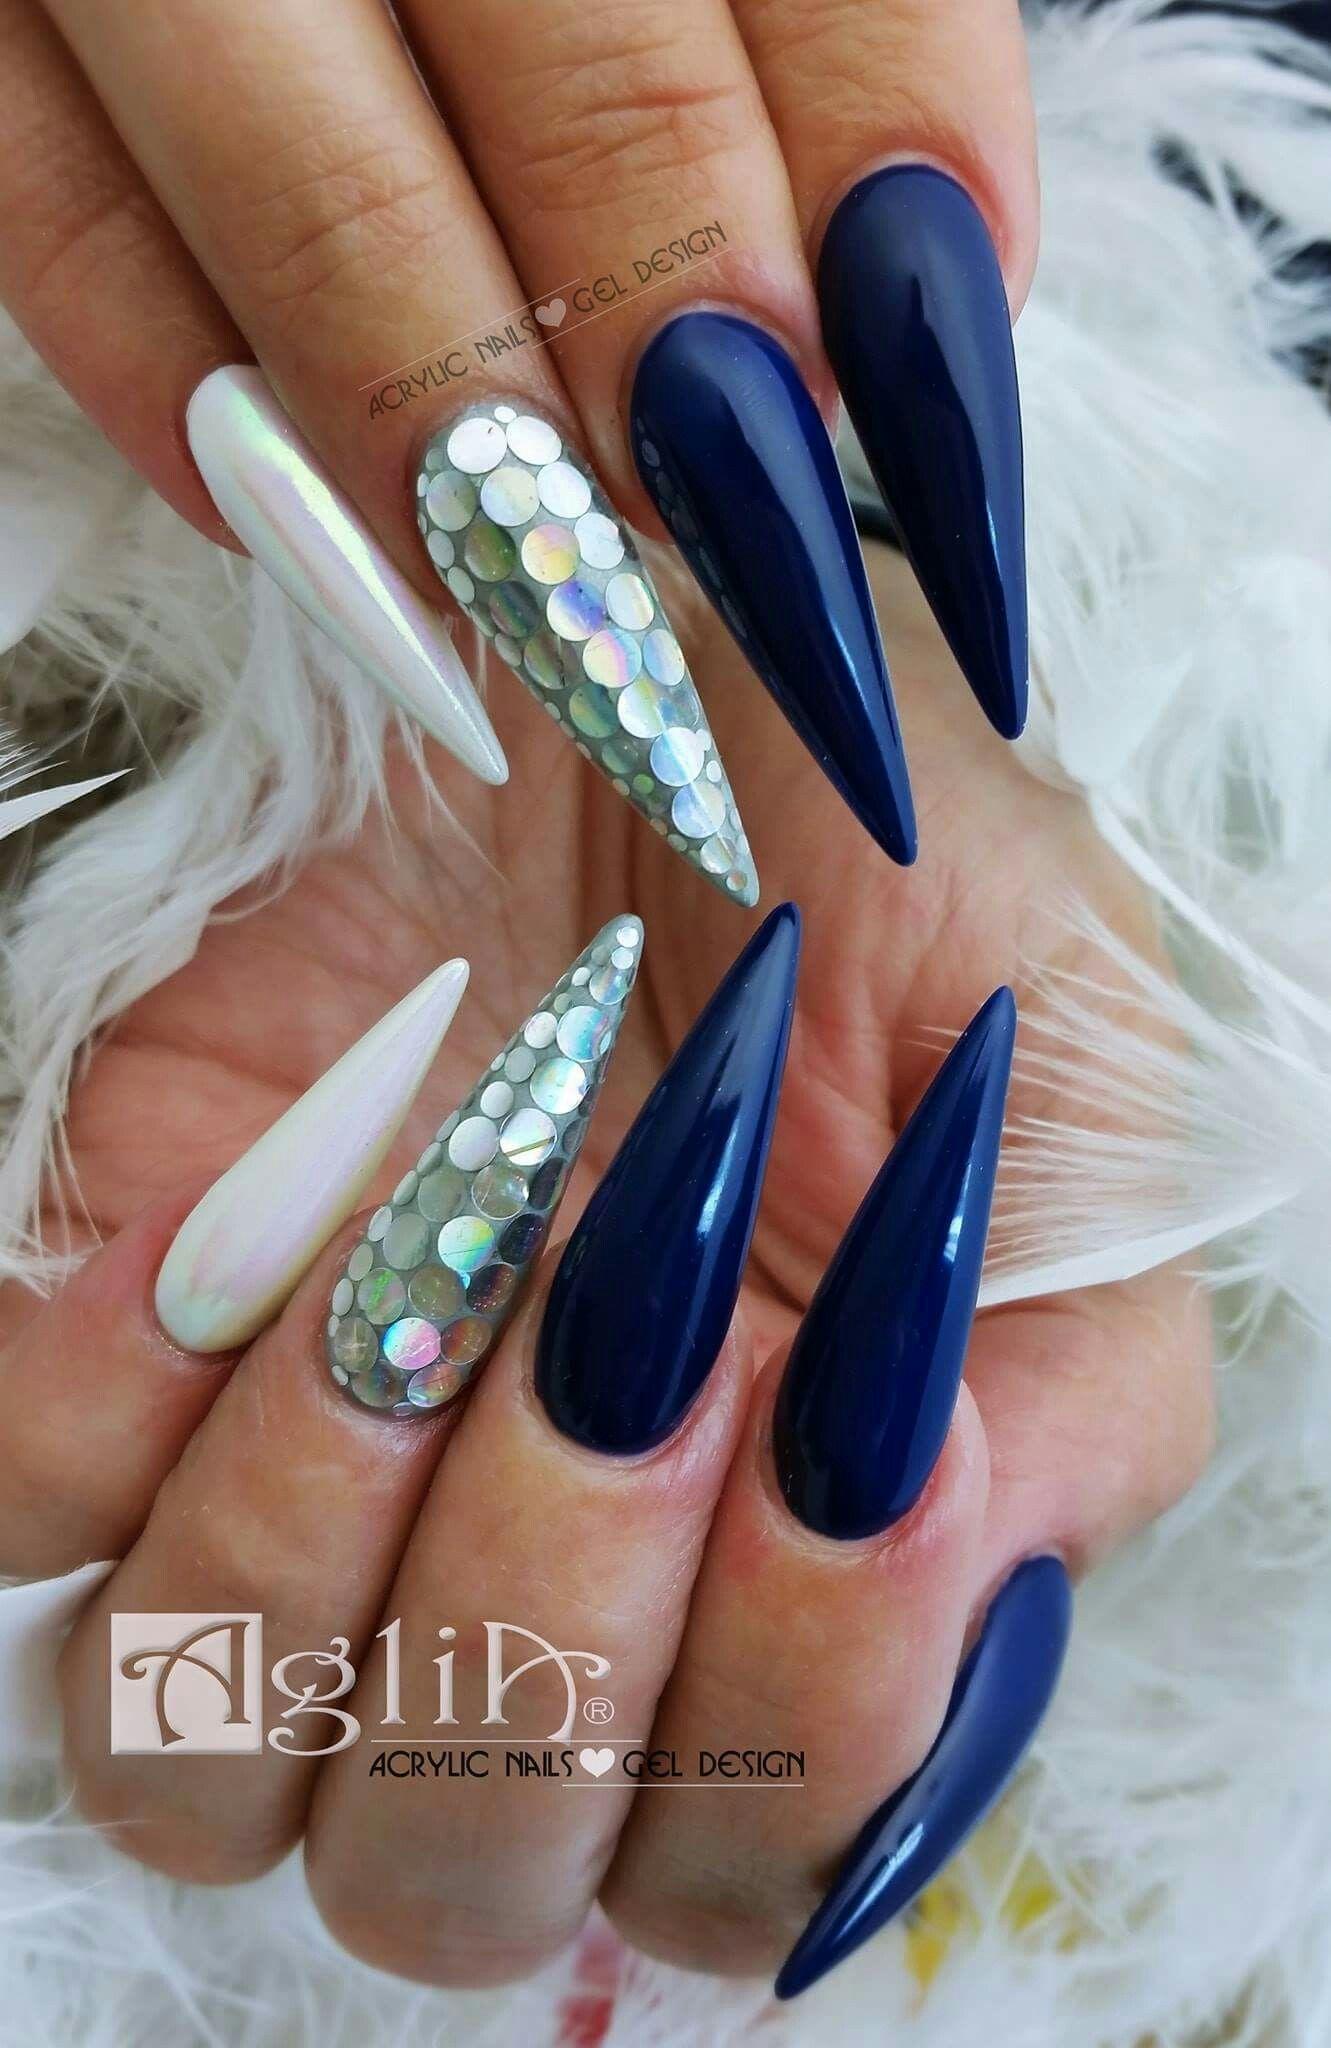 Acrylic Nails Gel Design Long Blue Nails Nehty